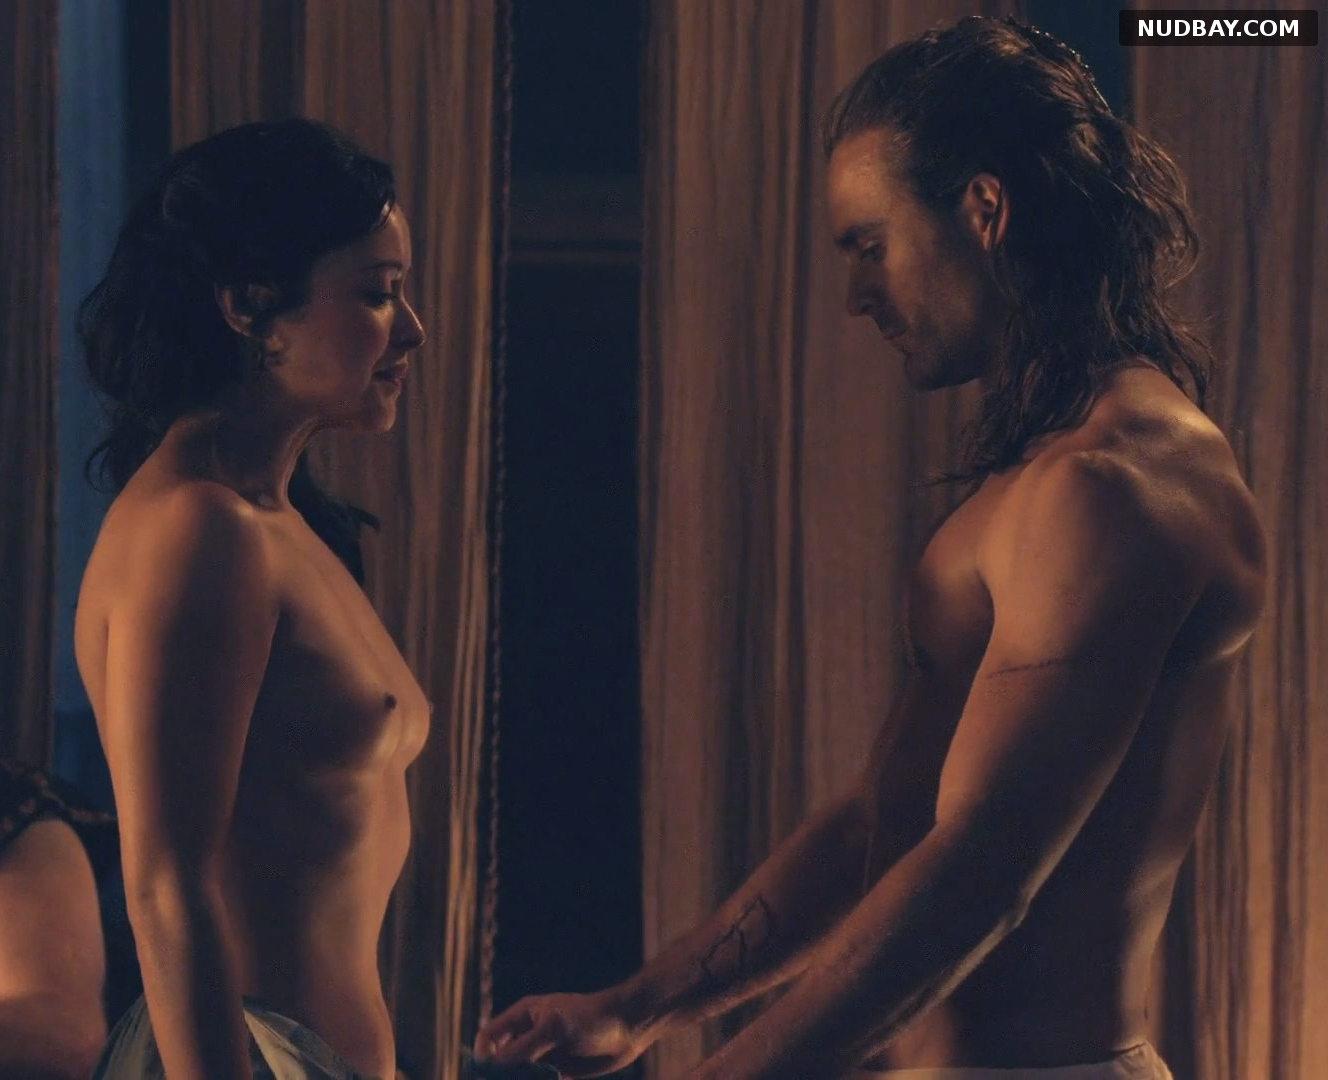 Marisa Ramirez nude in Spartacus: Gods of the Arena (2011)